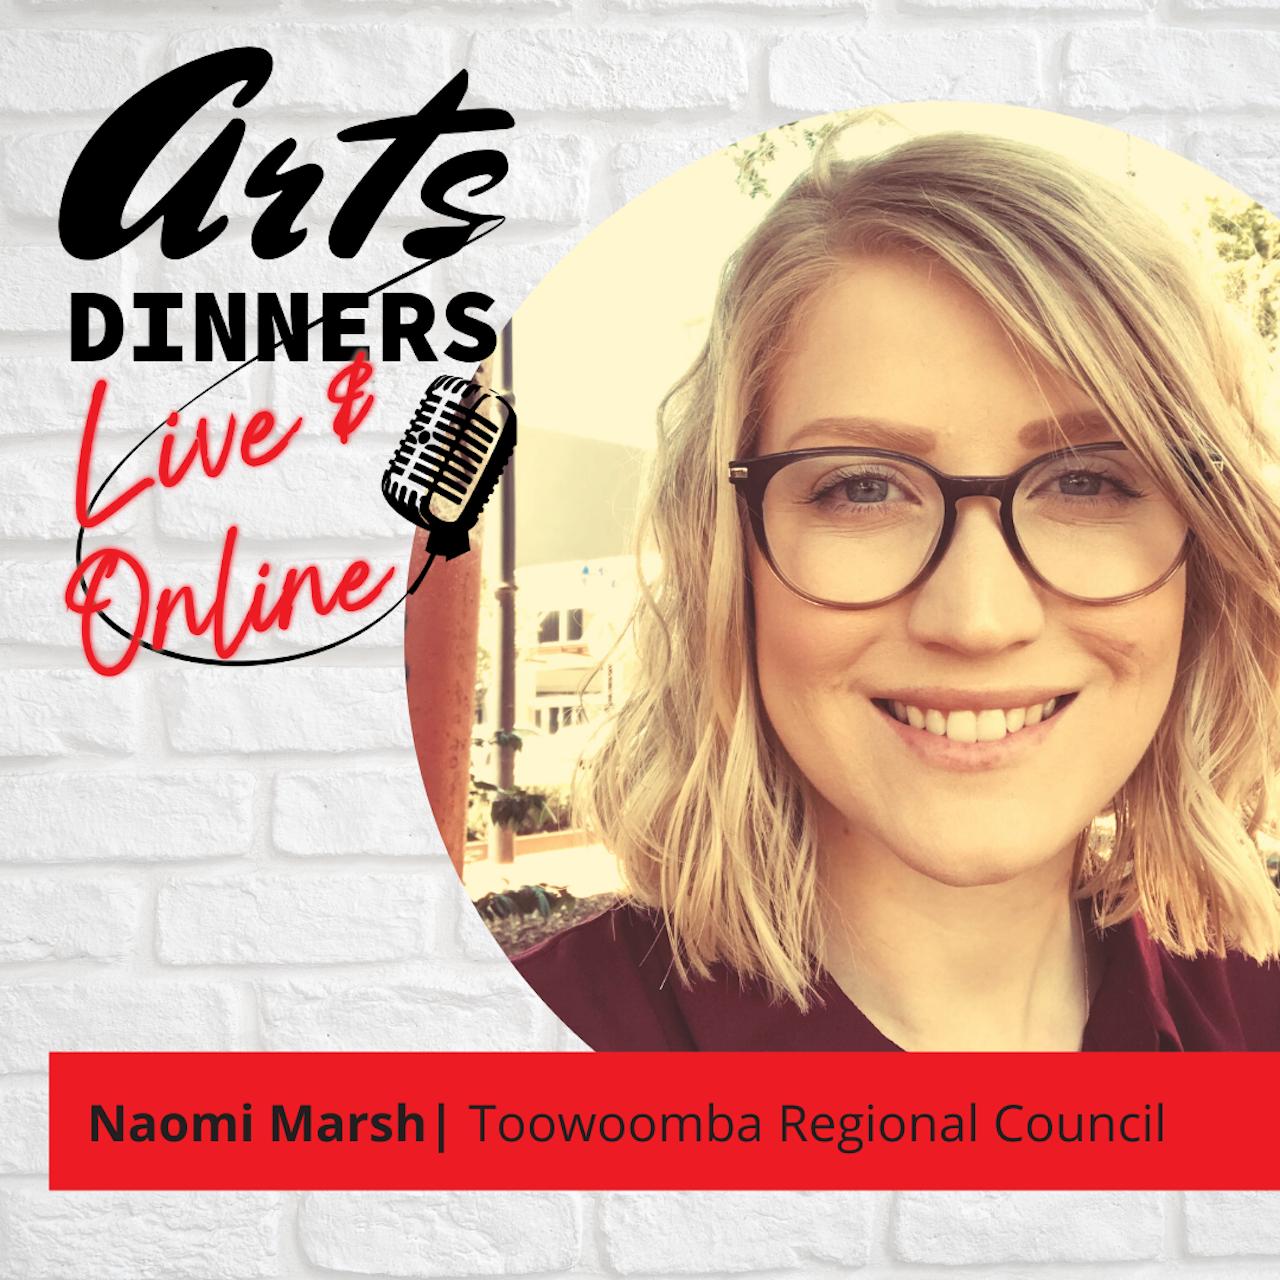 Naomi Marsh